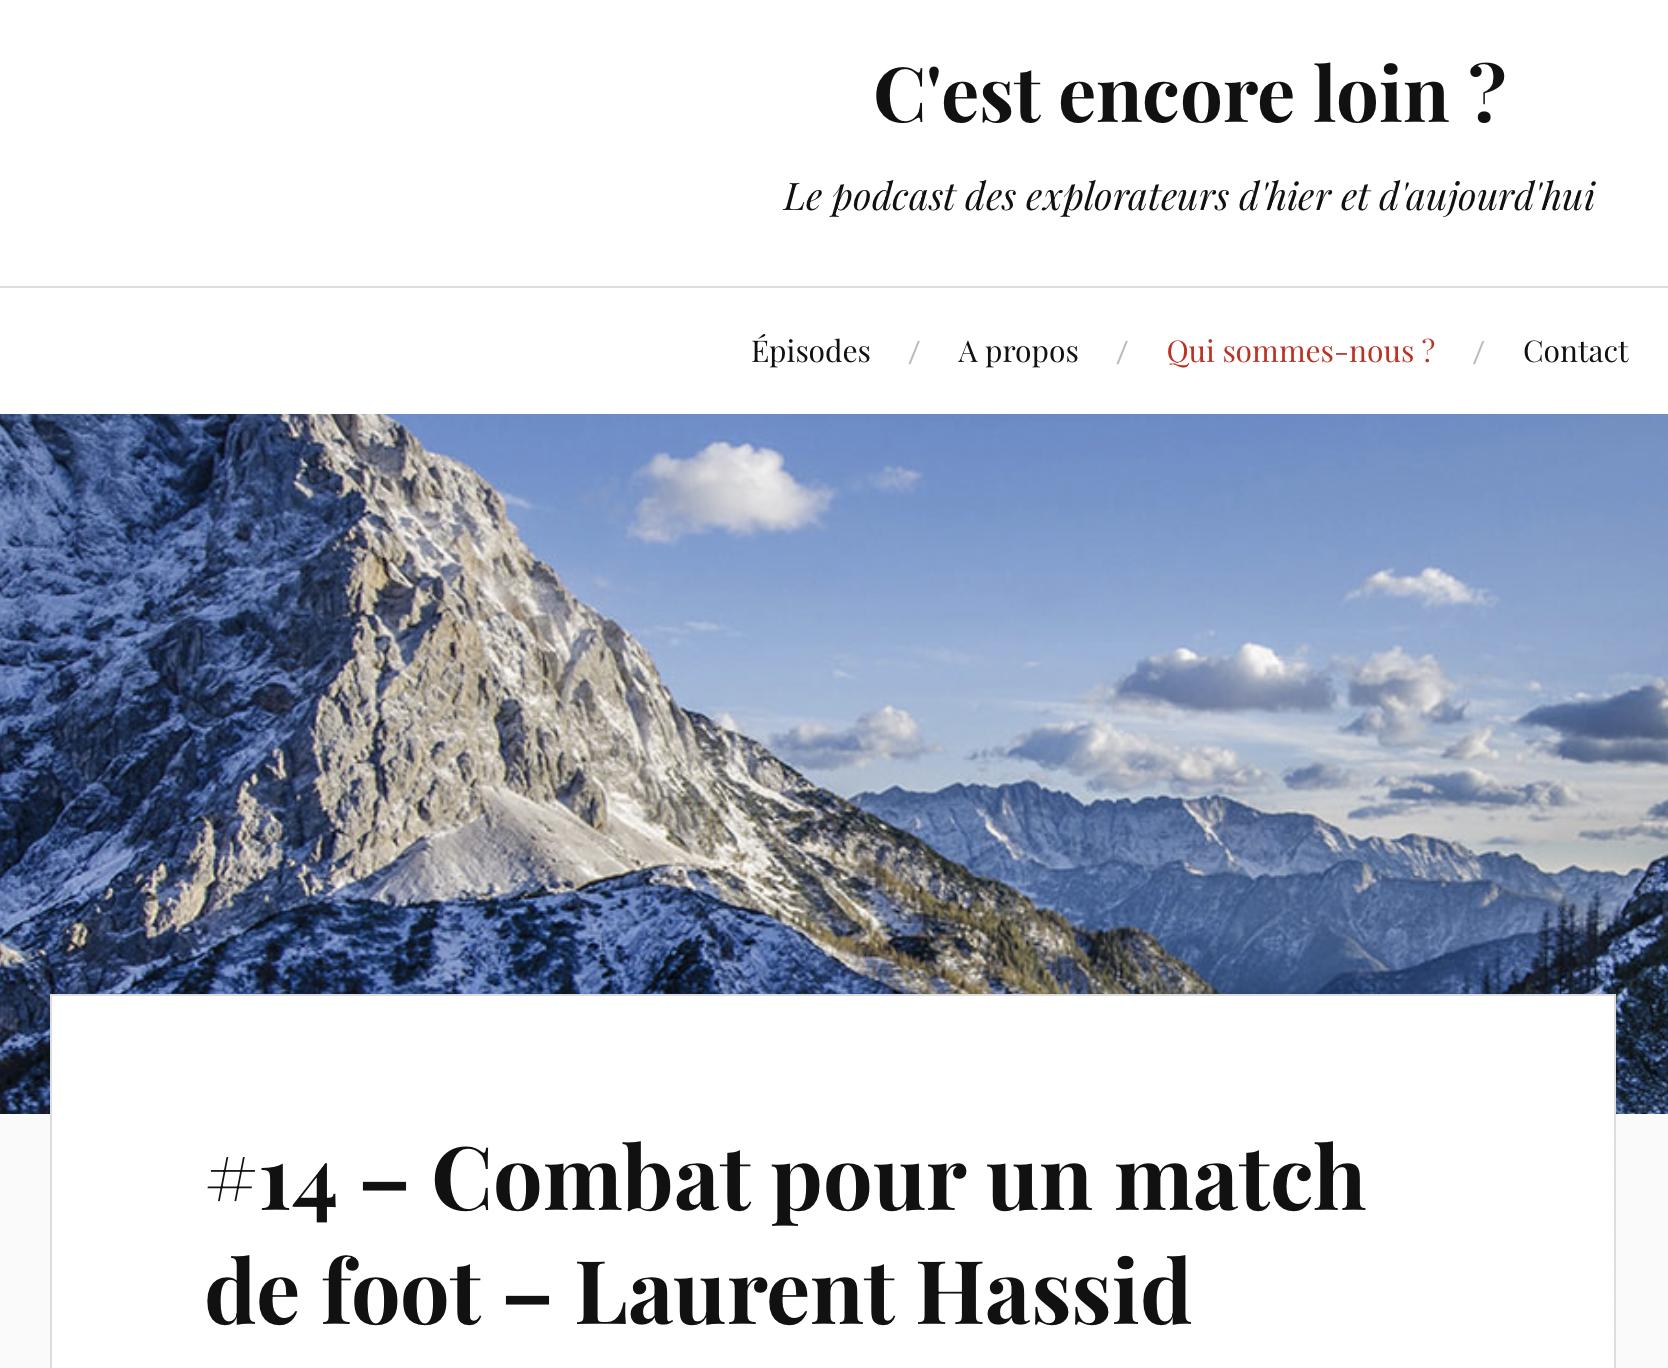 Laurent Hassid